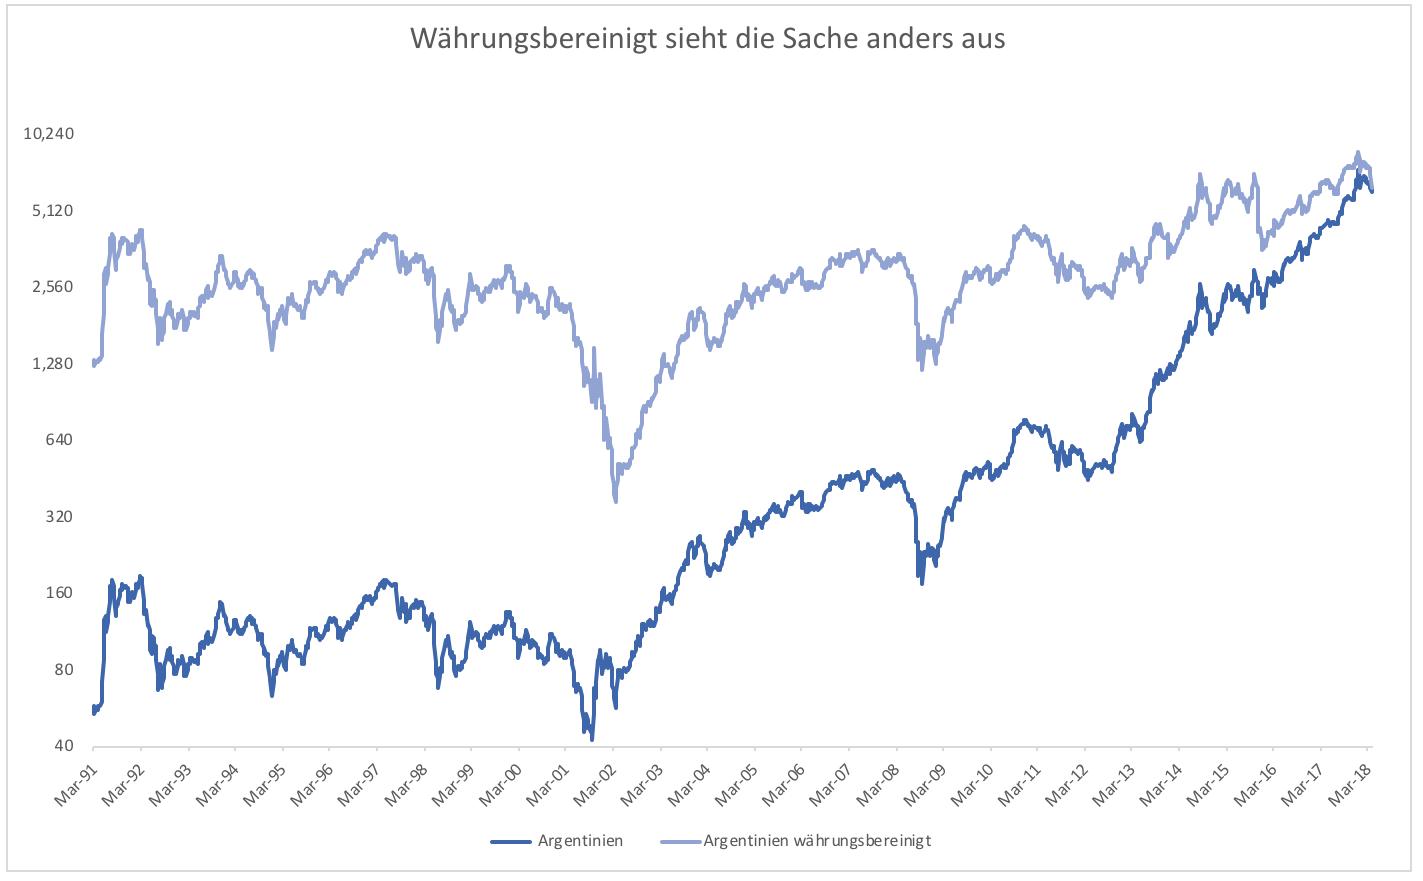 Emerging-Markets-Ausbruch-oder-Zusammenbruch-Kommentar-Clemens-Schmale-GodmodeTrader.de-3